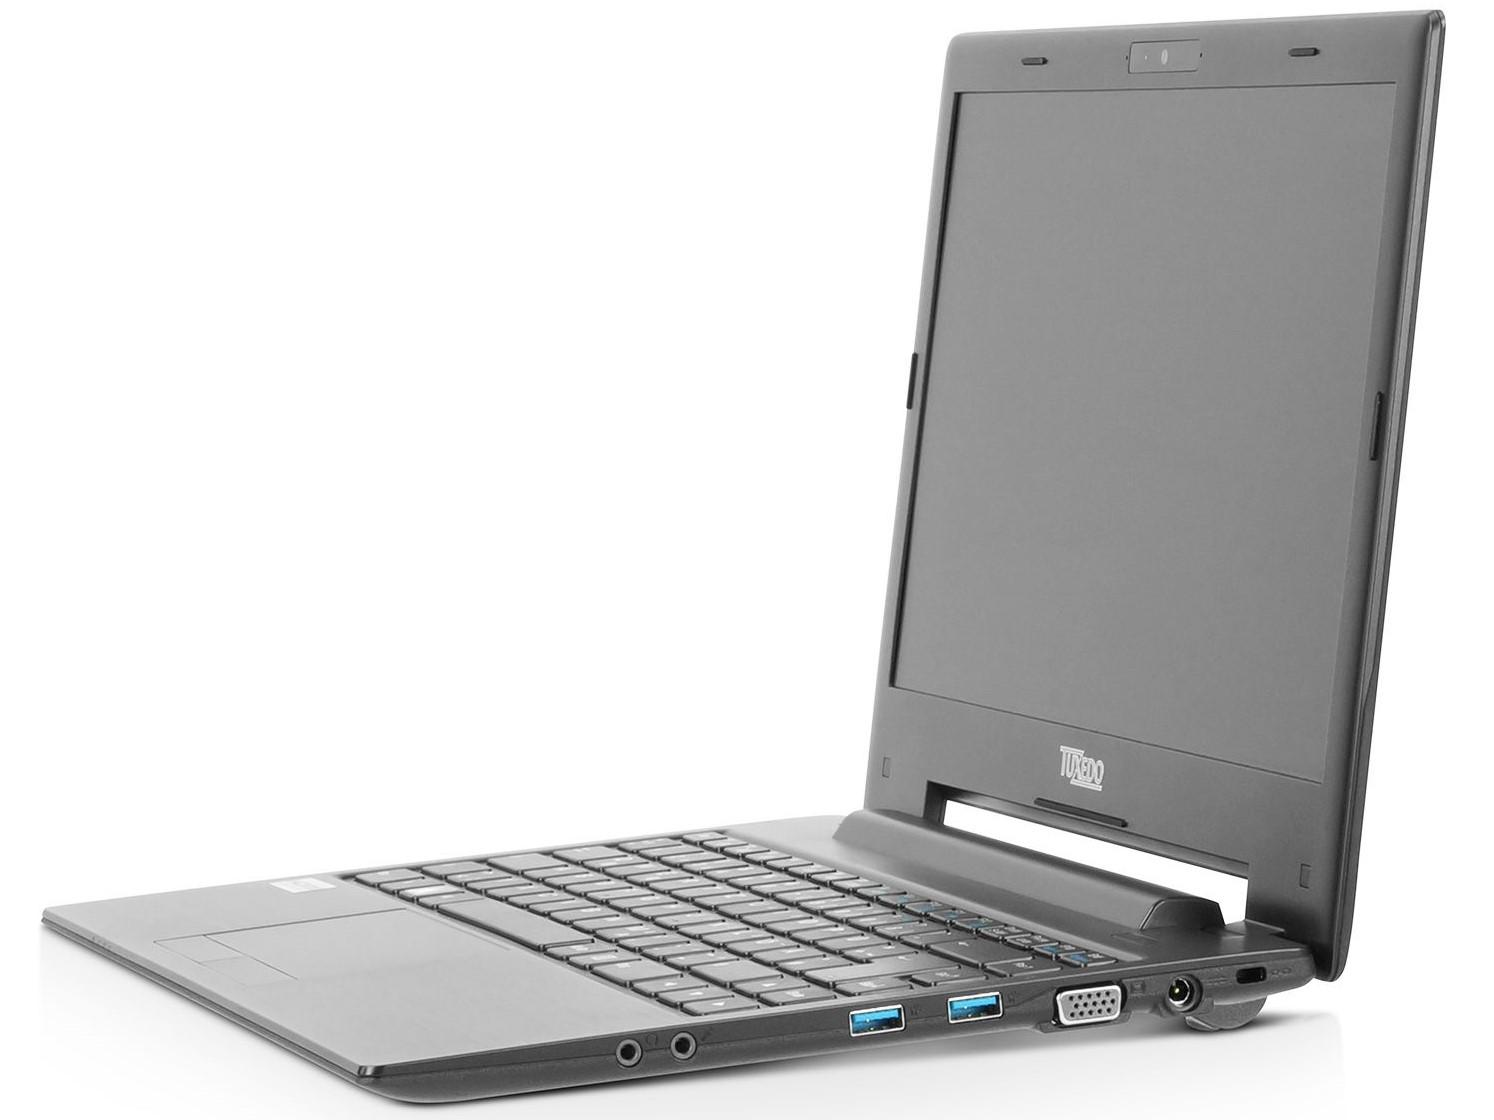 Test Tuxedo Book Bu1307 I7 8550u Uhd620 Laptop Notebookcheck Com Tests